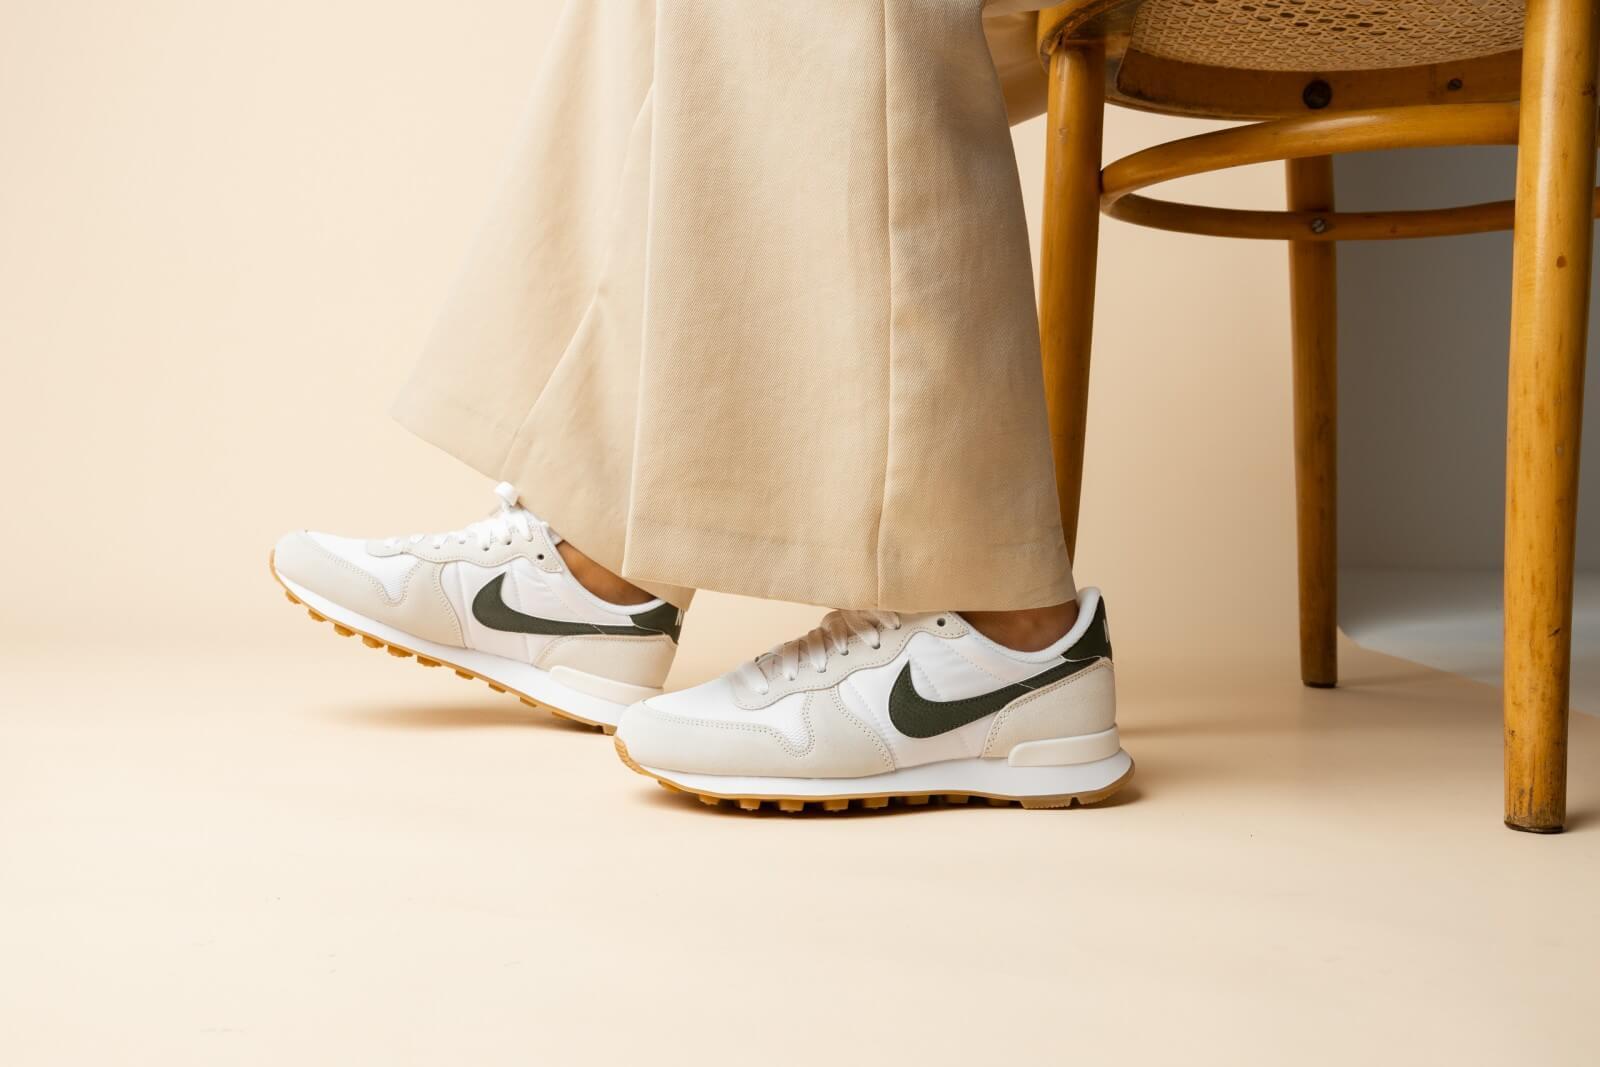 Nike Women's Internationalist White/Rough Green-Summit White